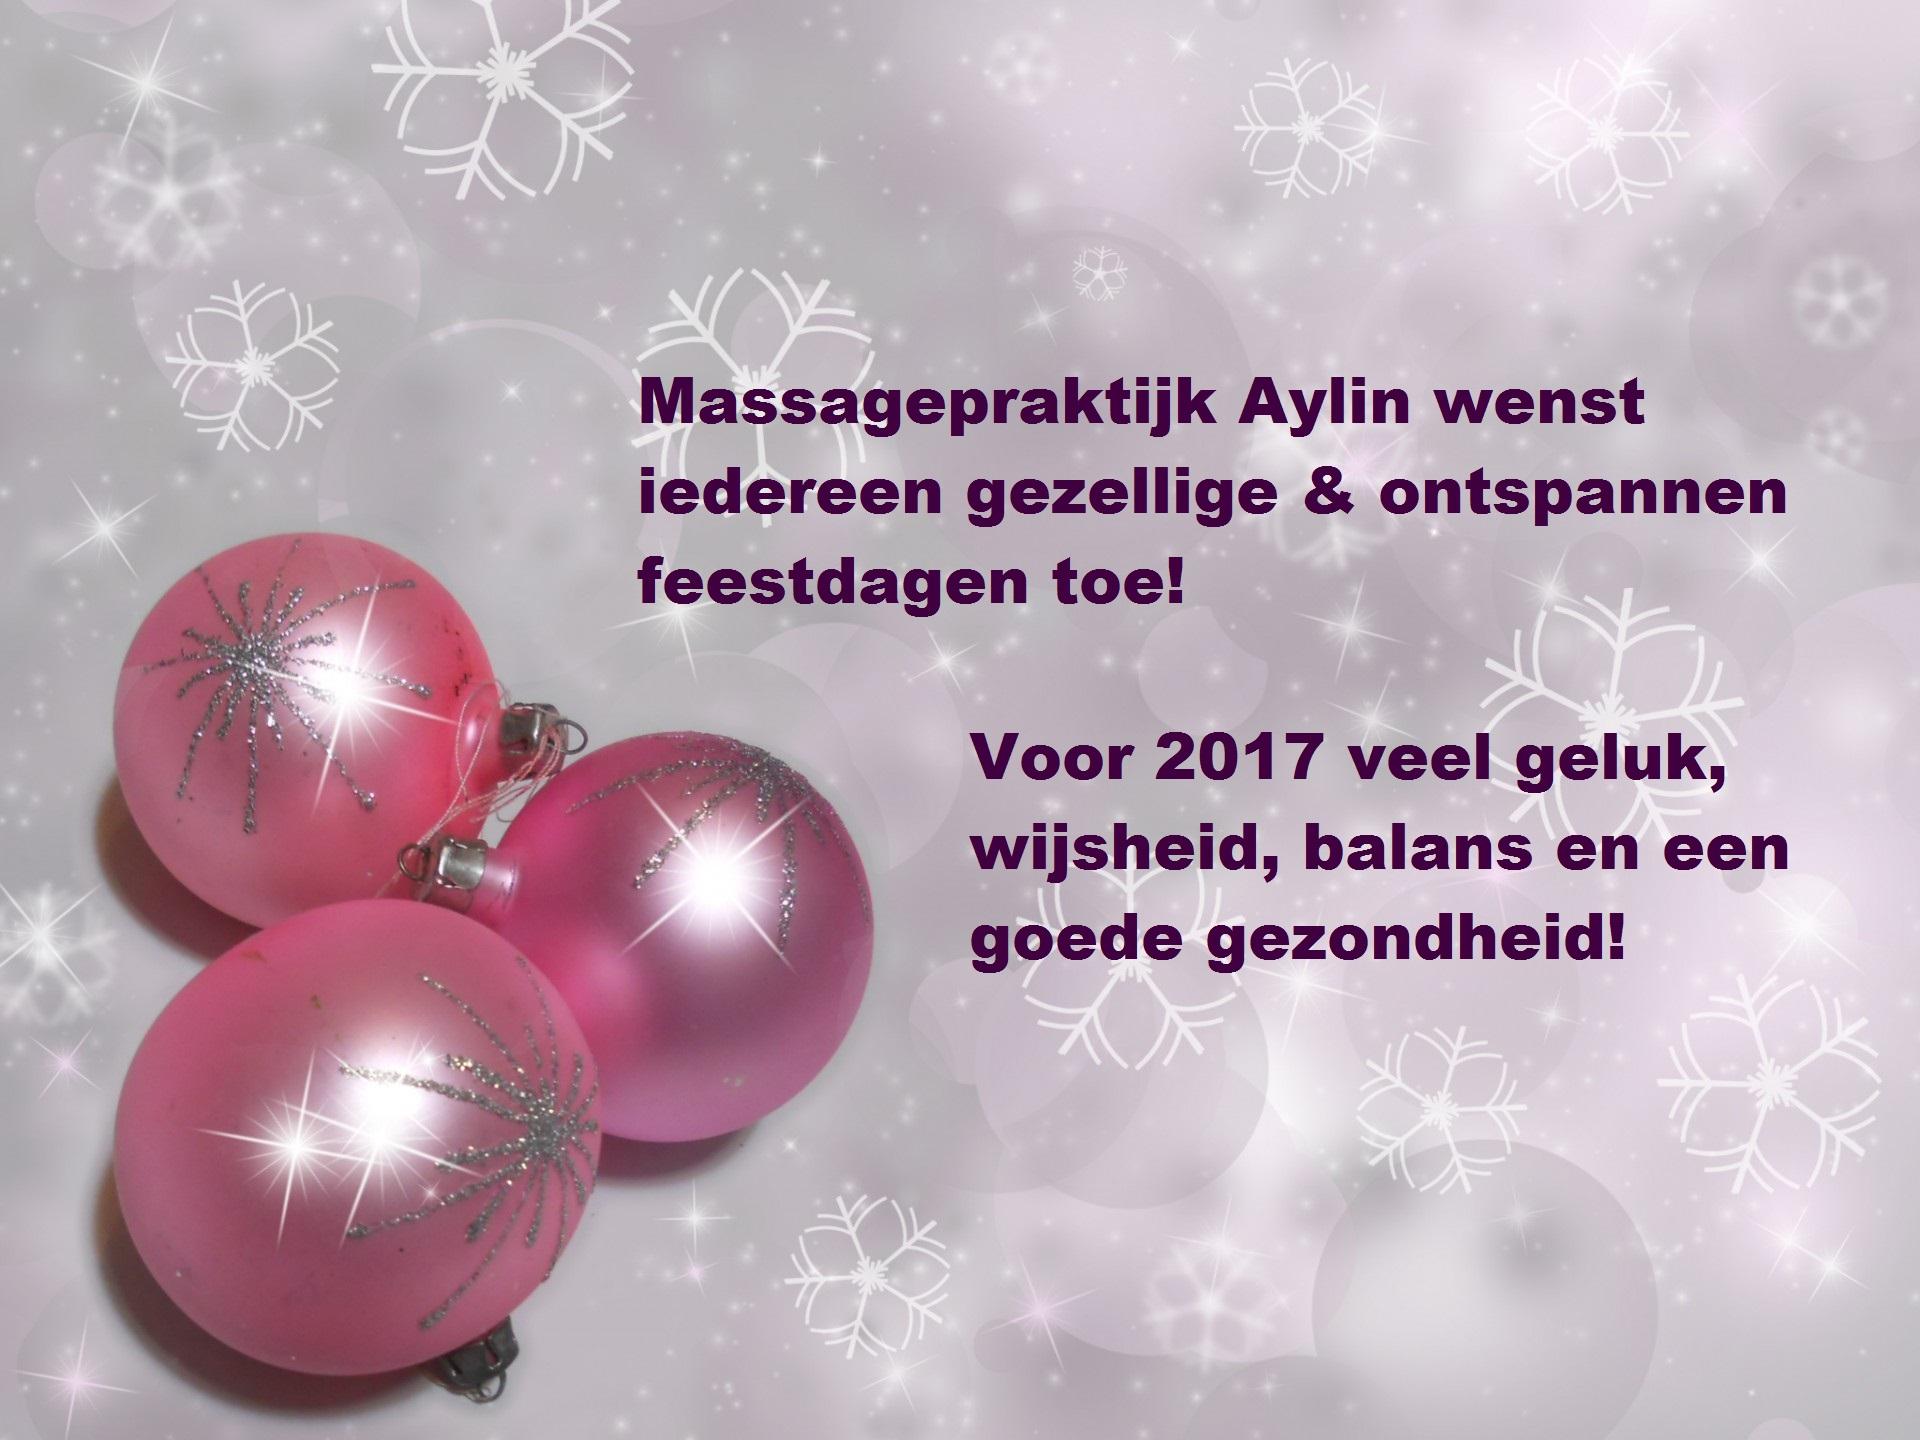 kerstwens 2016 Massagepraktijk Aylin